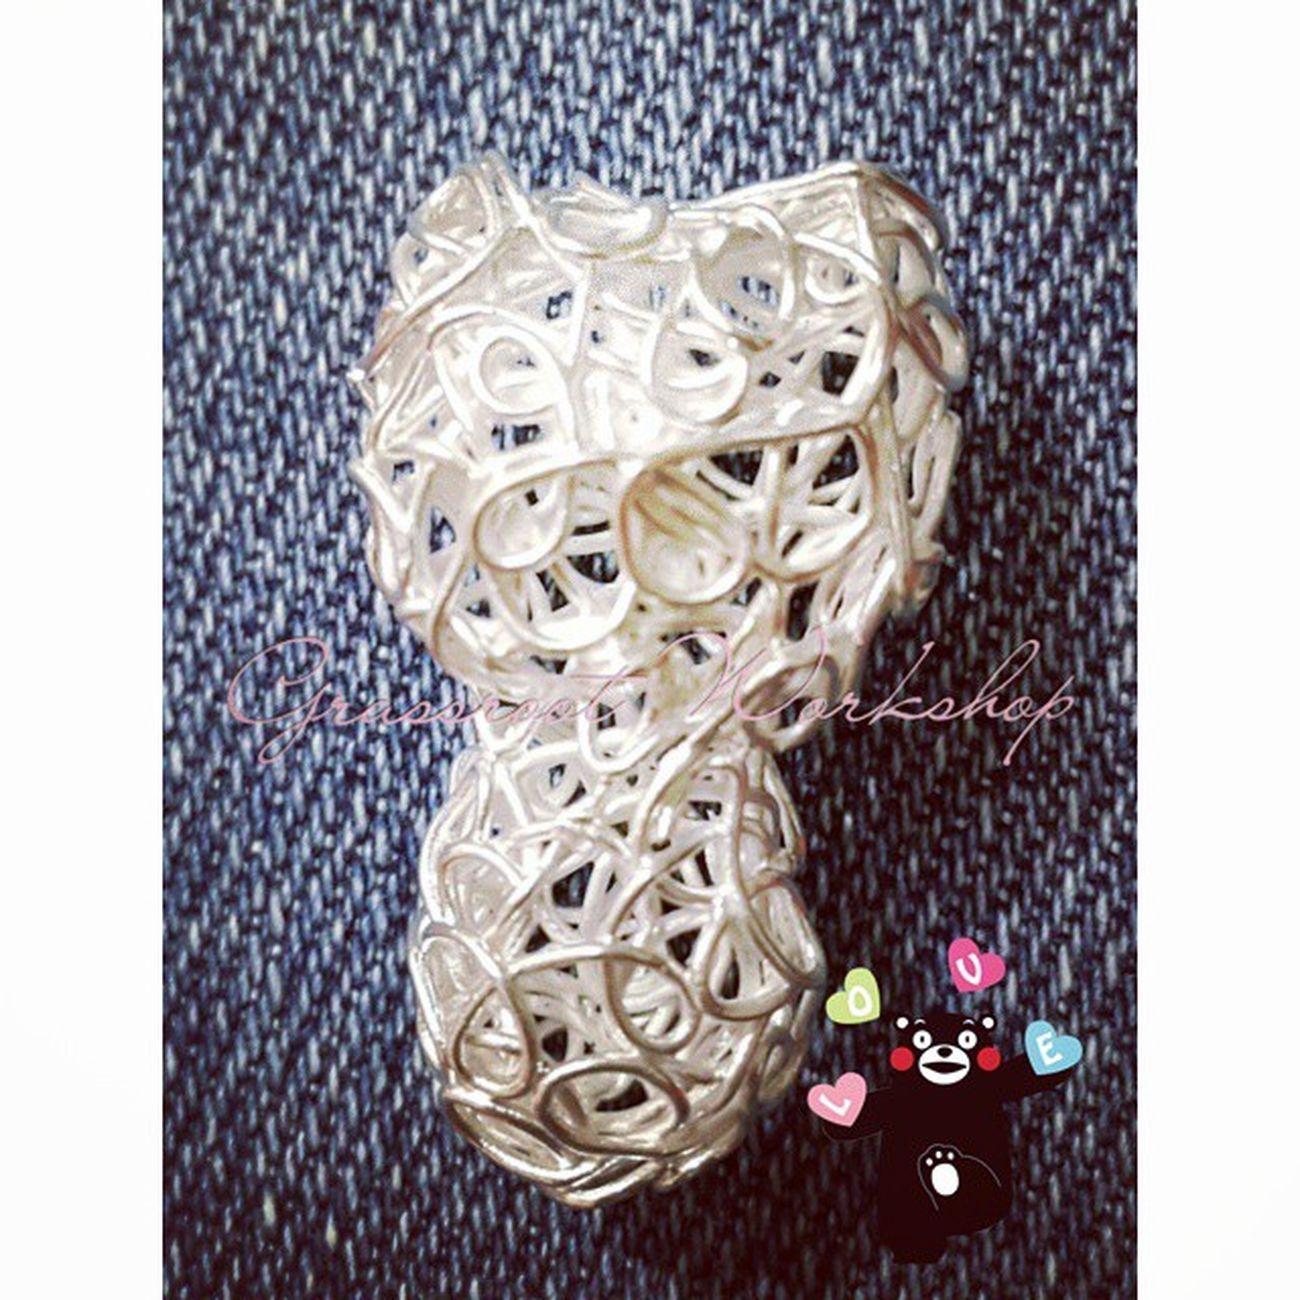 Pmc 銀黏土 貓形 99 .9 純銀 PMC handmade hongkongshop onlineshop accessories silver clay 手工藝 手作 香港店 網店 Diy